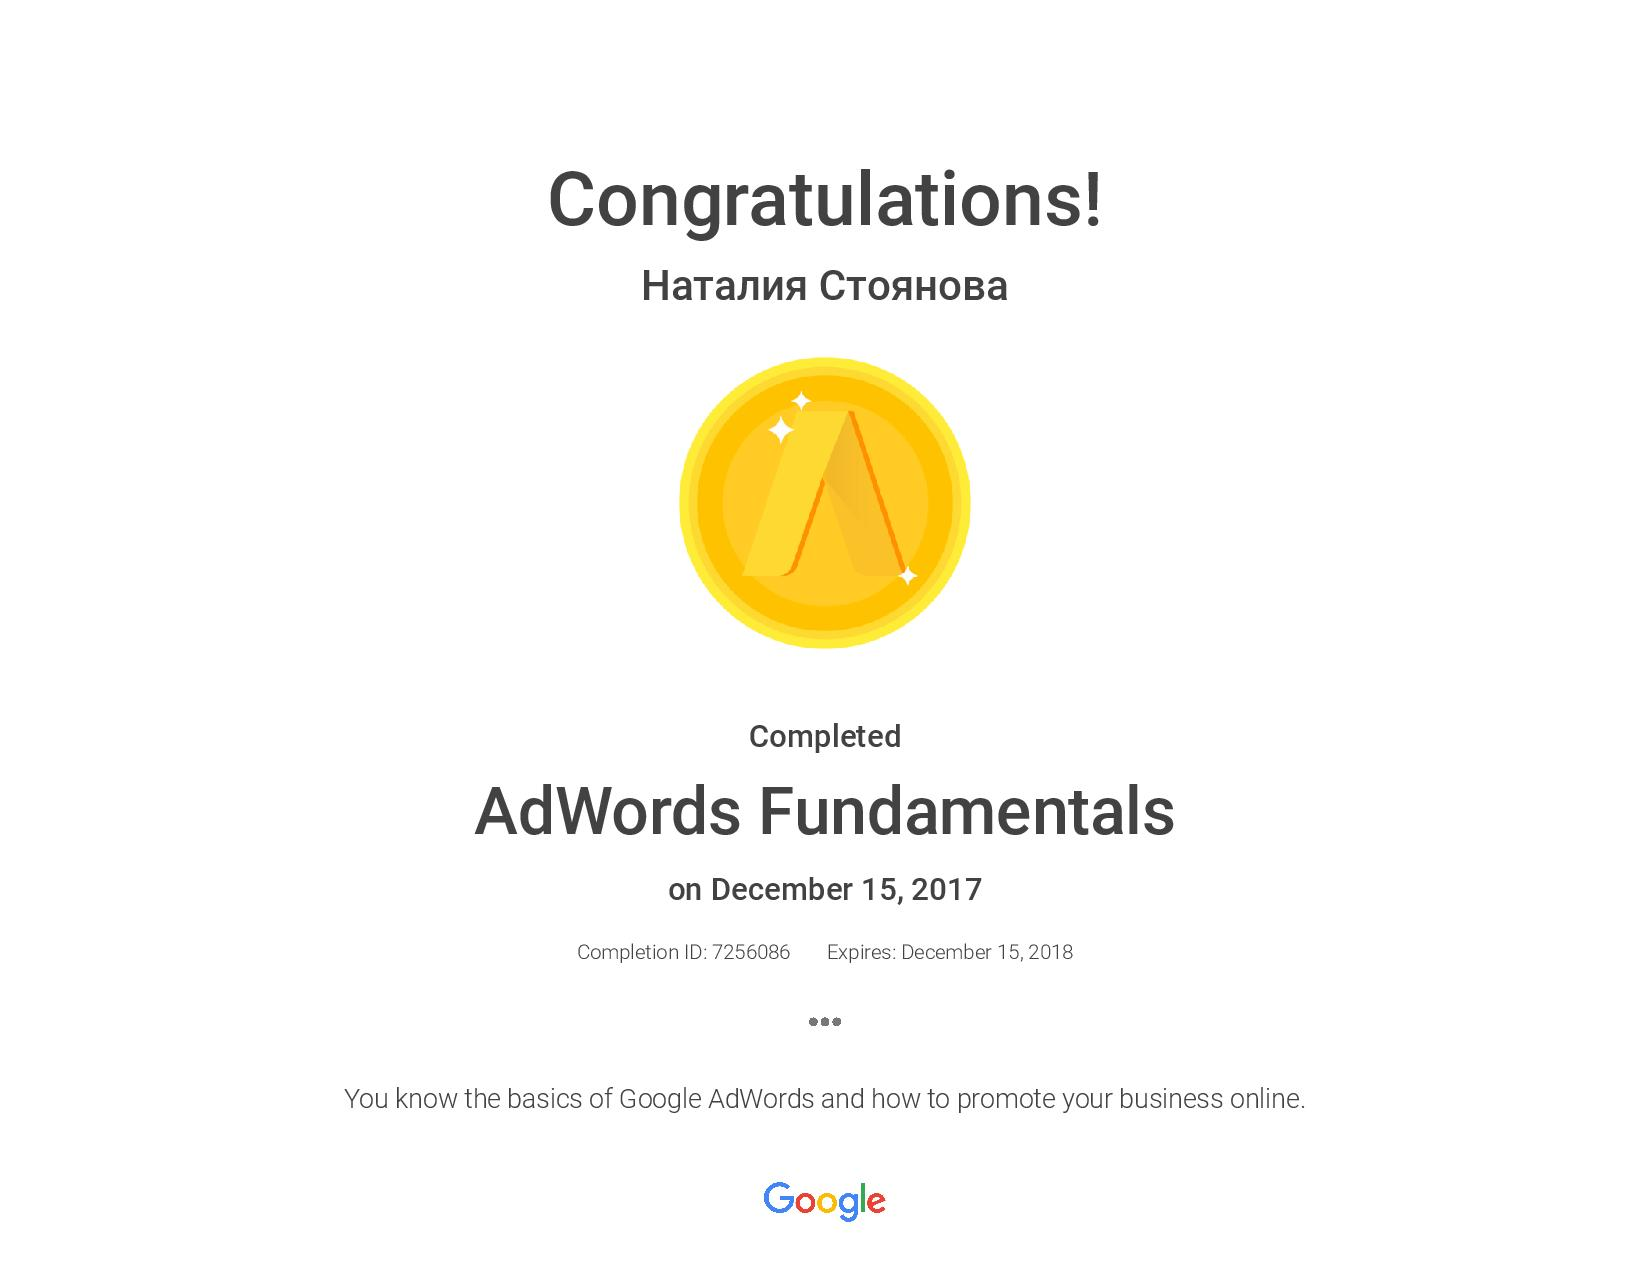 Natalia niya – Google AdWords